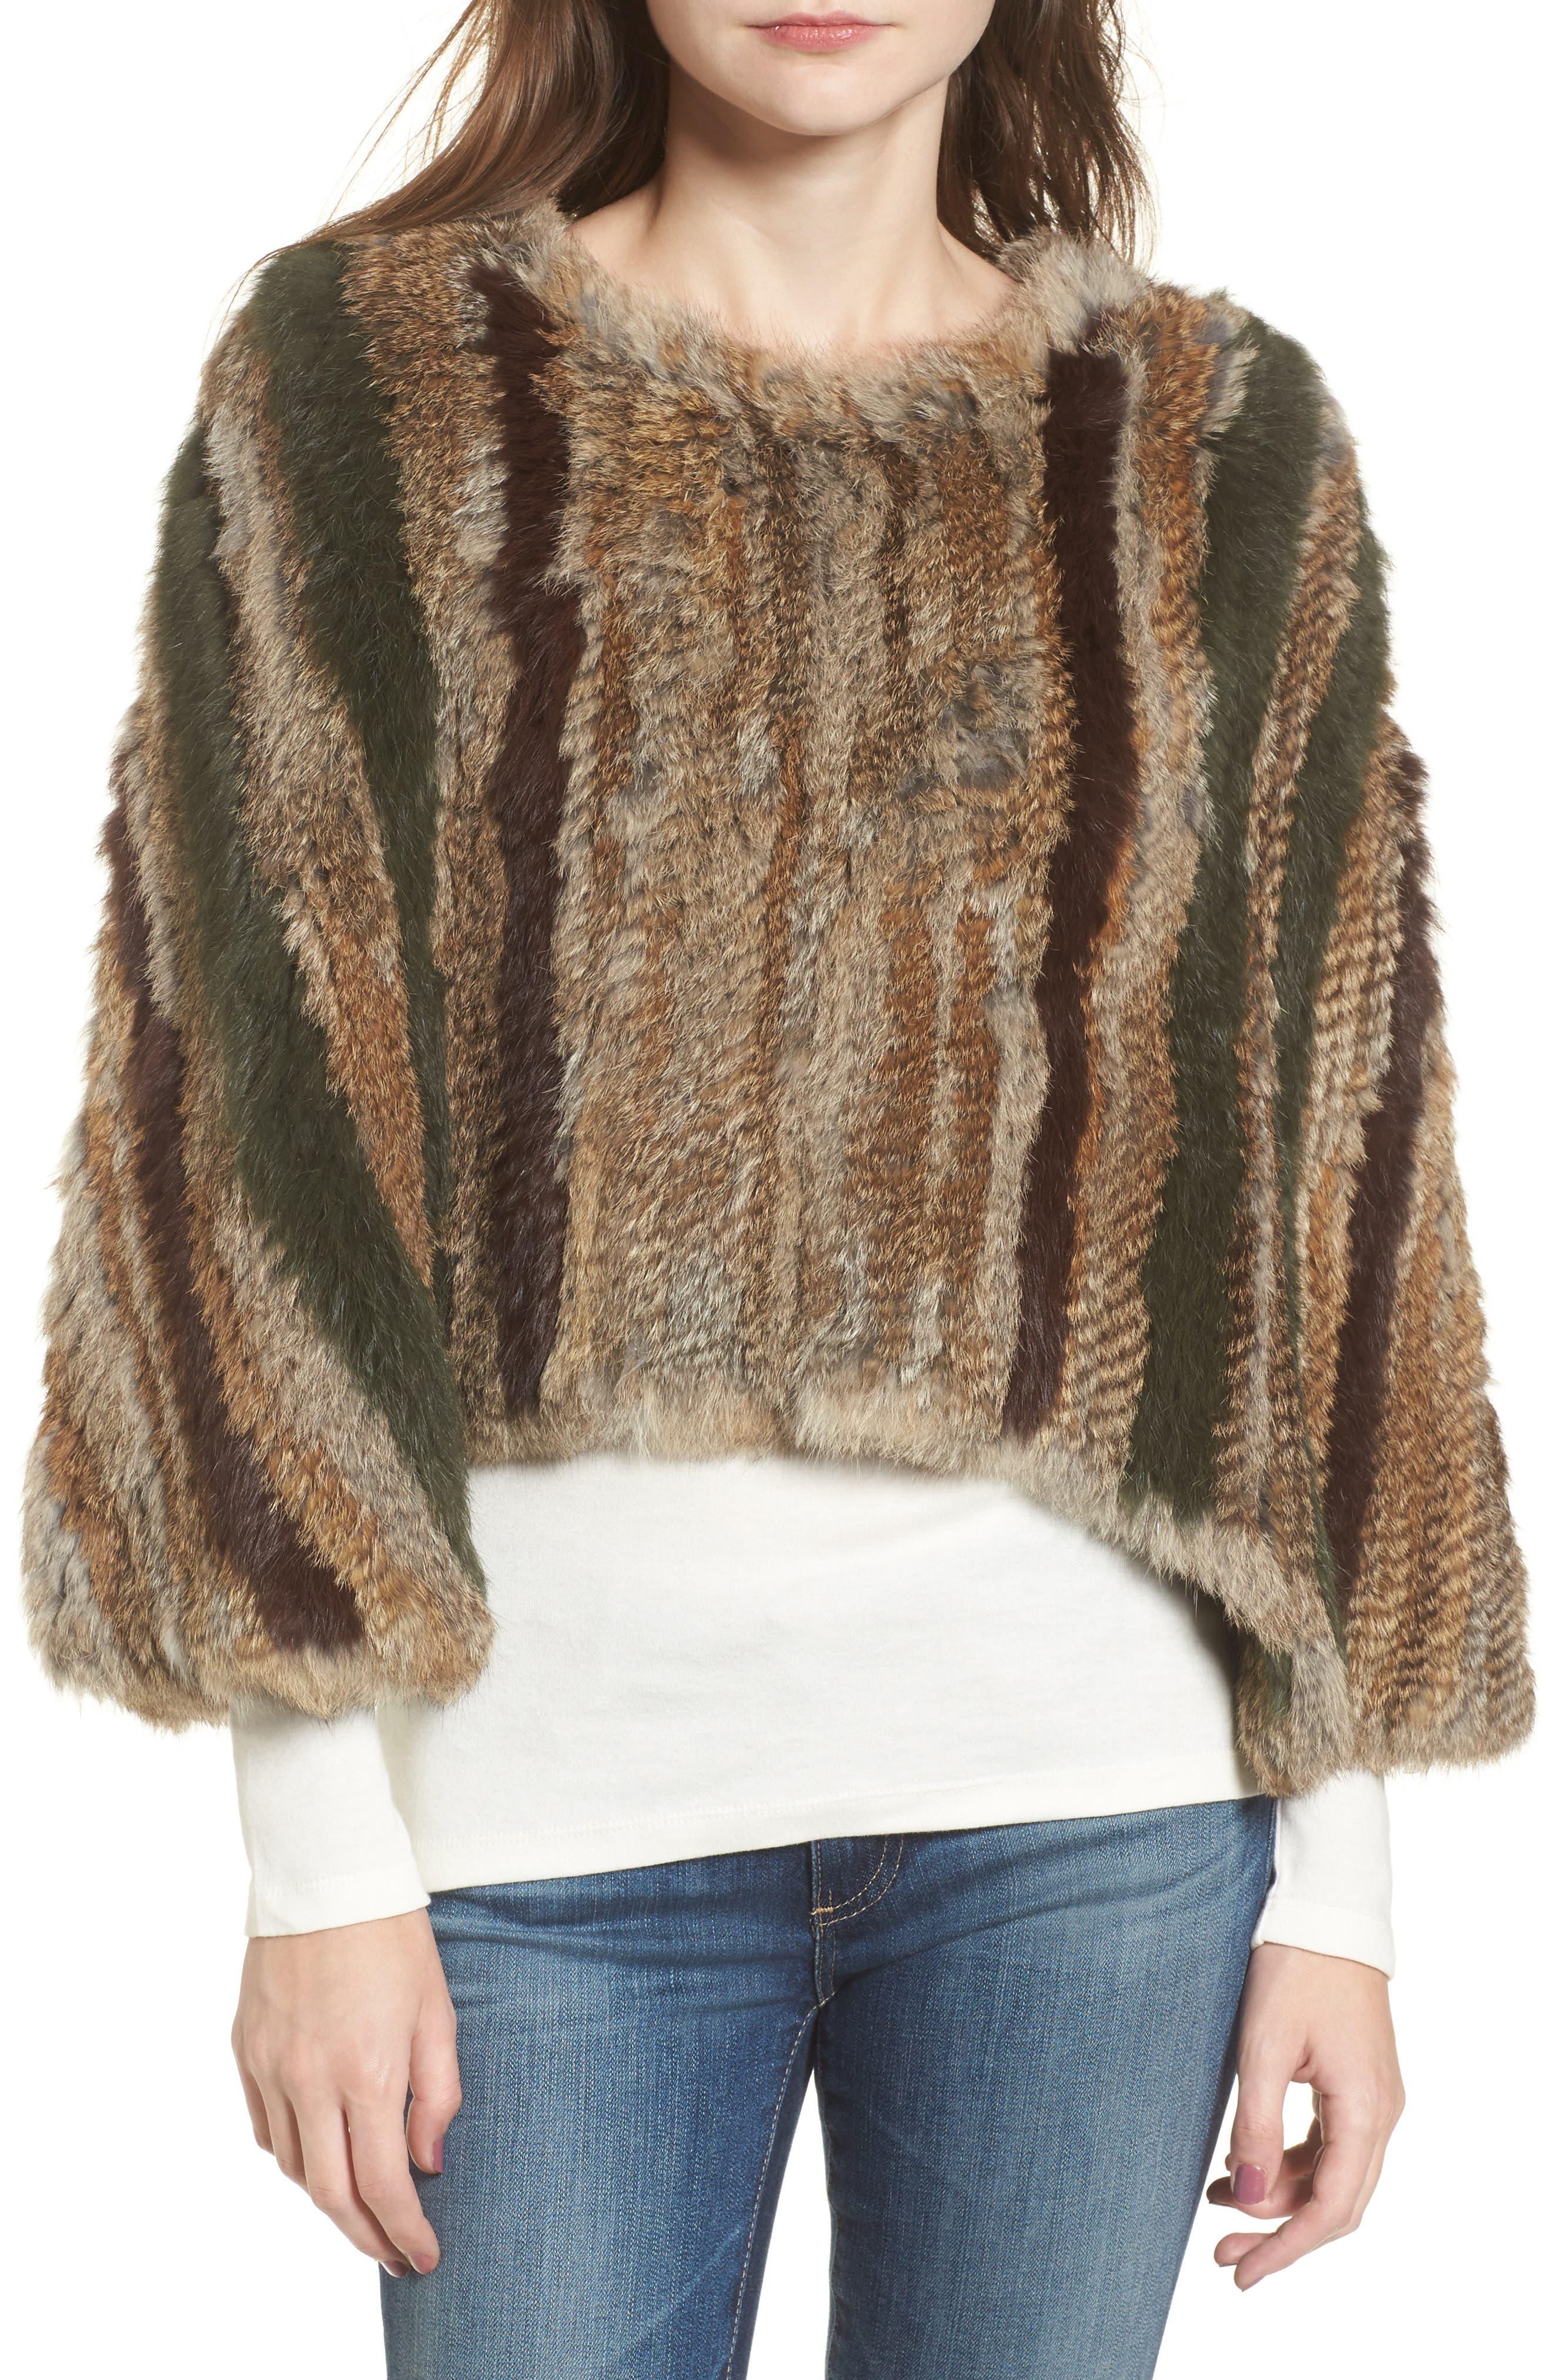 BNCI Nomad Genuine Rabbit Fur Pullover